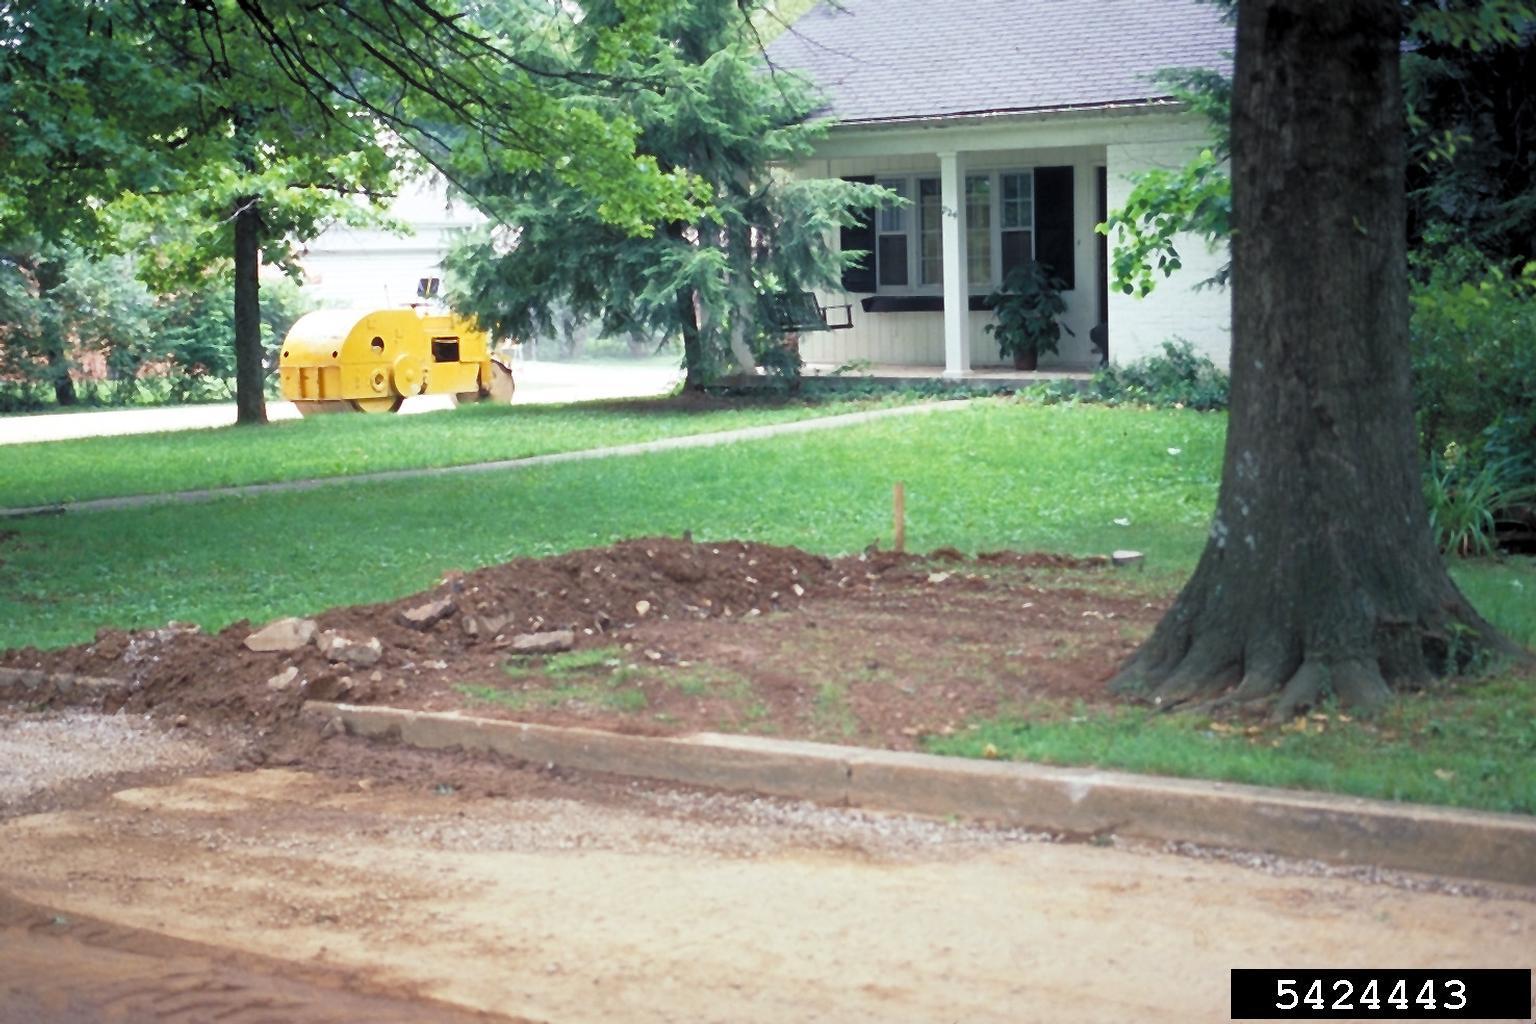 Sewer Line Excavation - John Hartman, University of Kentucky, Bugwood.org